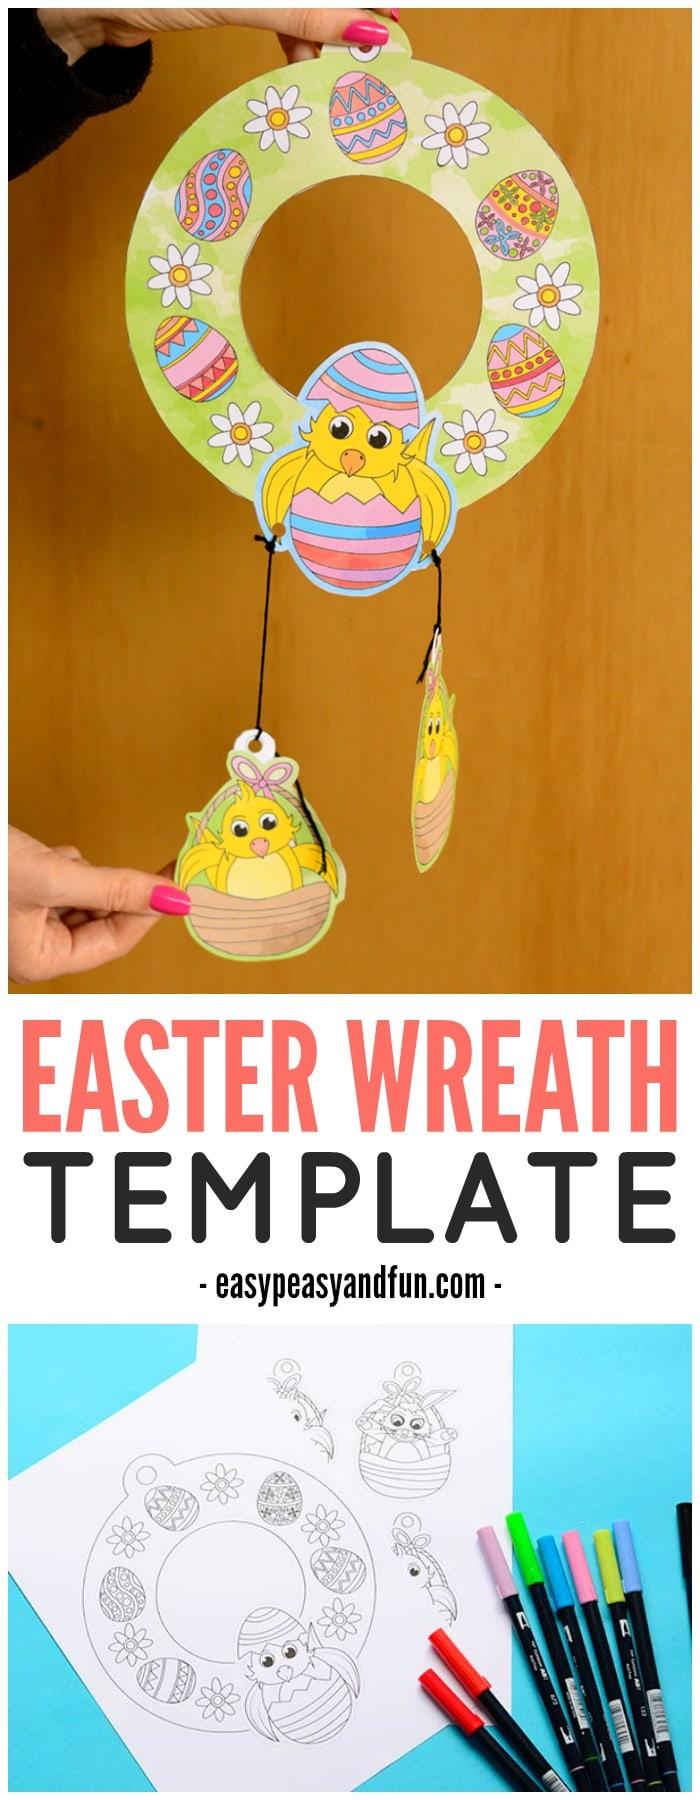 Adorable Printable Easter Wreaths